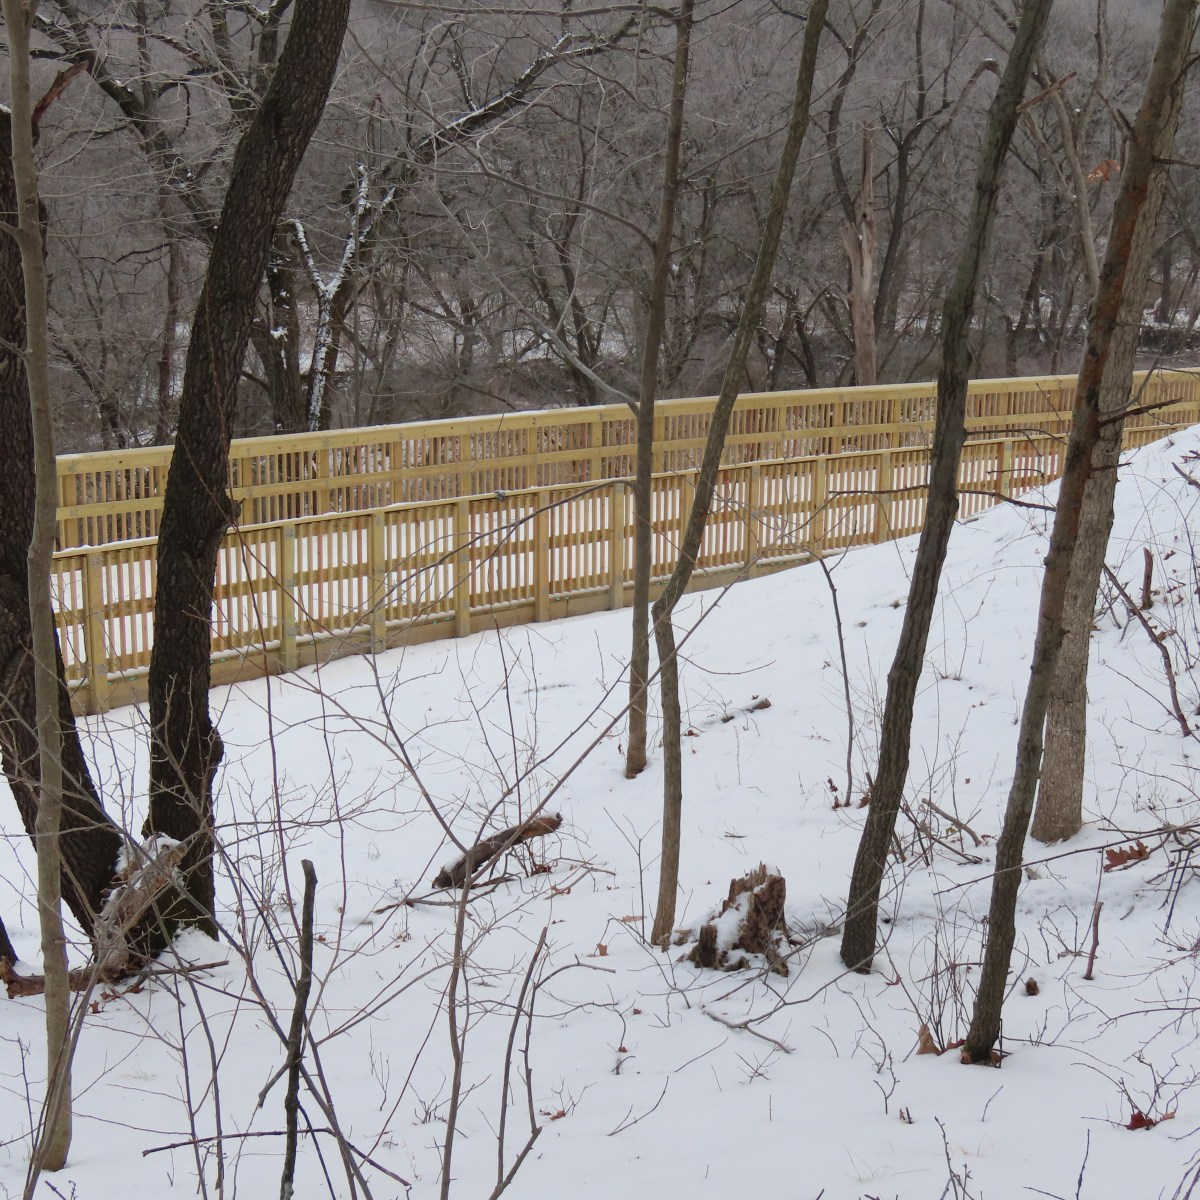 A bluff near a wooden boardwalk